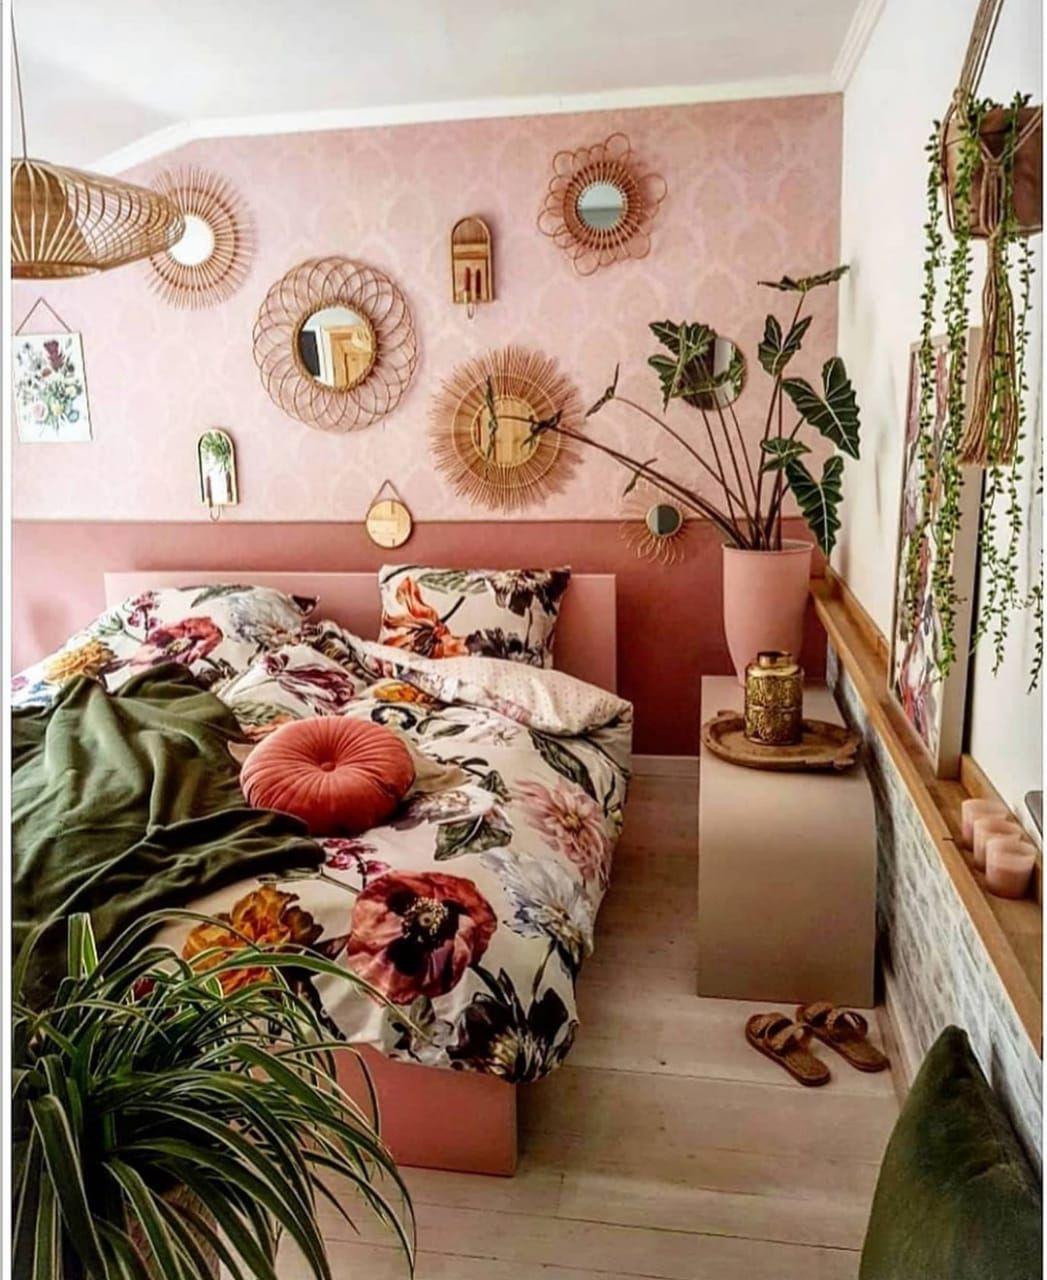 #bohemian #boho #decor #decoration #interiors #bohemianroom #roomdecor #homedecor #greenspace #indoorplants #eclecticdecor #eclectic #quirky #bohodecor #bohemiandecor #livingroom #outdoorspace #balconydecor #antiquedecor #antique #vintage #decorinspo #plants #homeproud #homedecorinspiration #vacaygoals #staycation #homedecorgoals Home decor ideas, home office, home office ideas, home interior design, home balcony, home decor